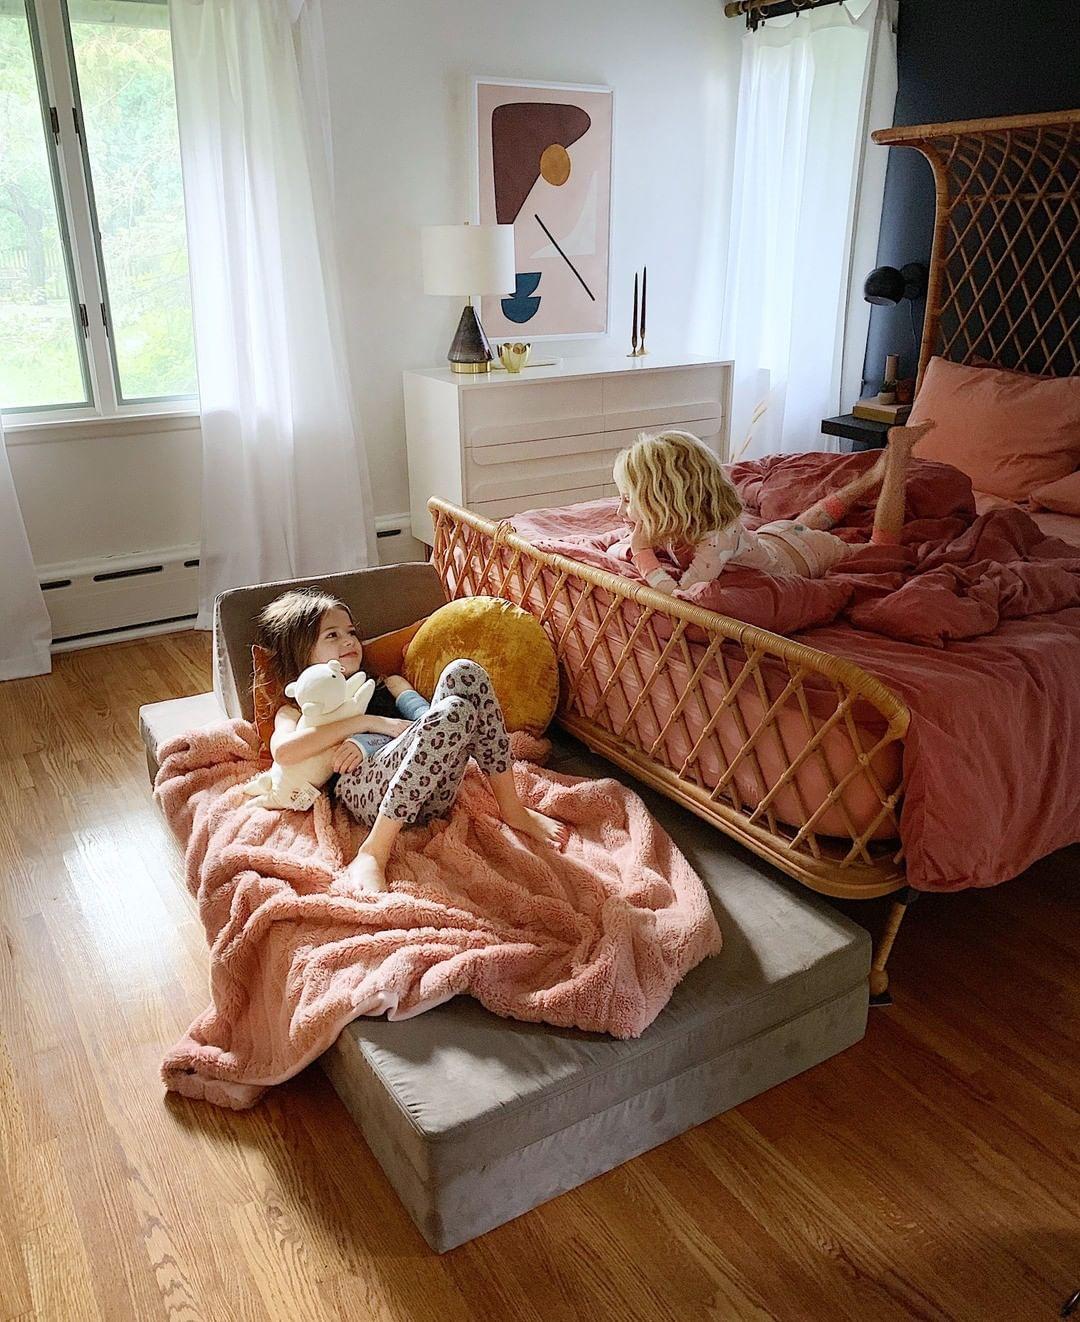 People nugget   Kotatsu table, Decor, Home decor